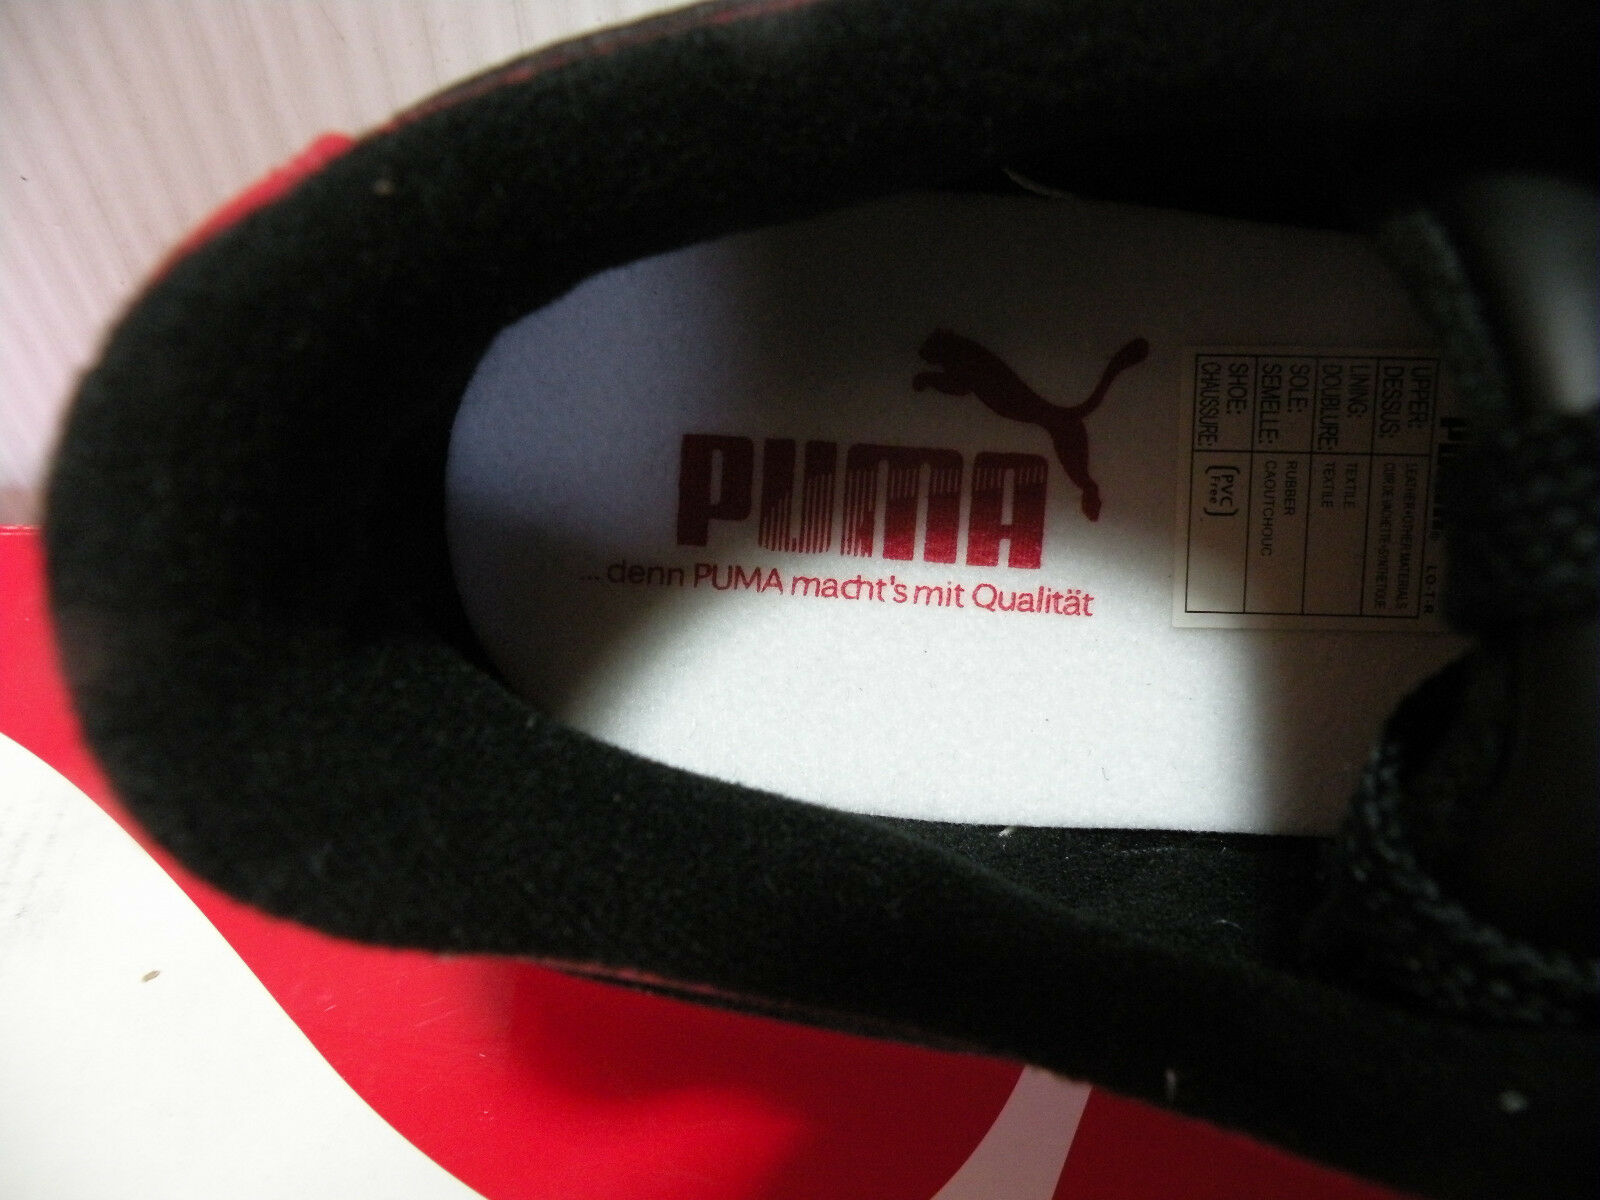 PUMA SKY II + + + CLASSIC LOW zapatillas MEN zapatos rojo negro 343753-08 Talla 7.5 NEW 208f64